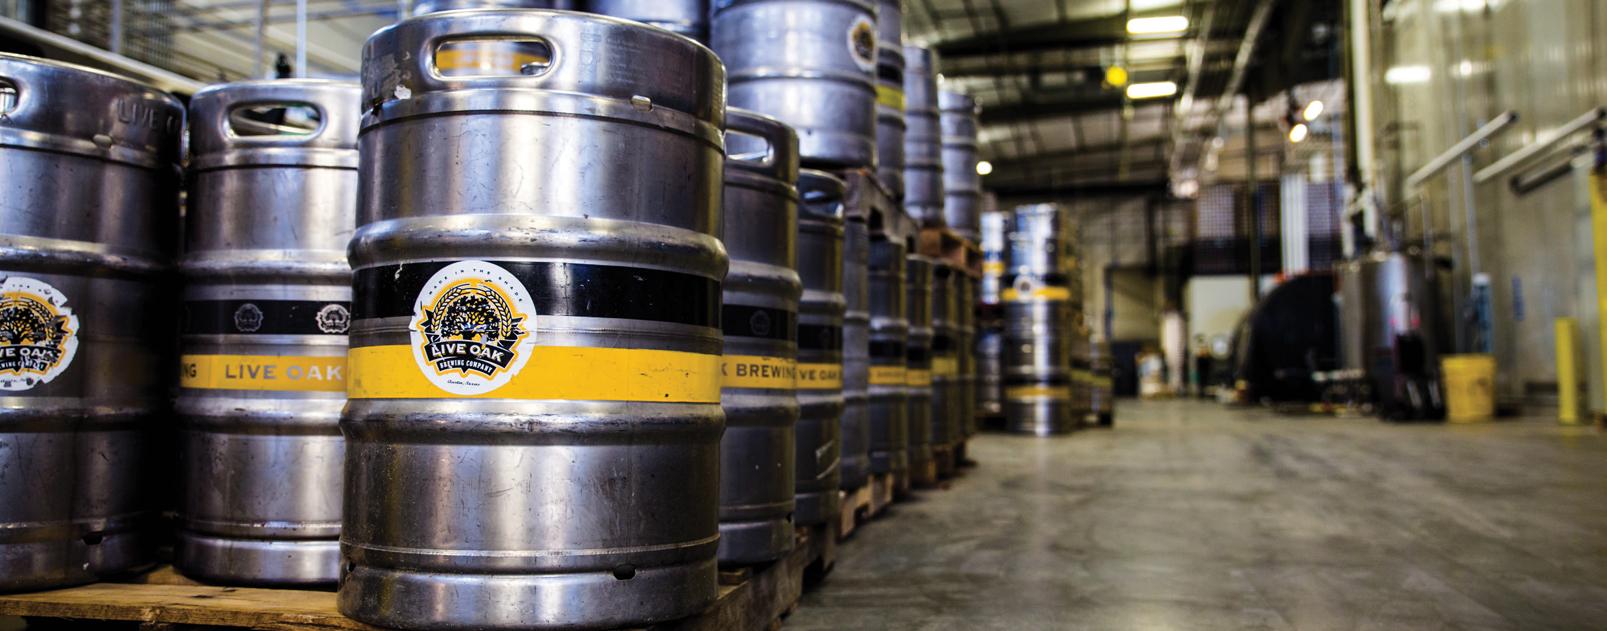 live oak brewery | Austin, TeXas | usa